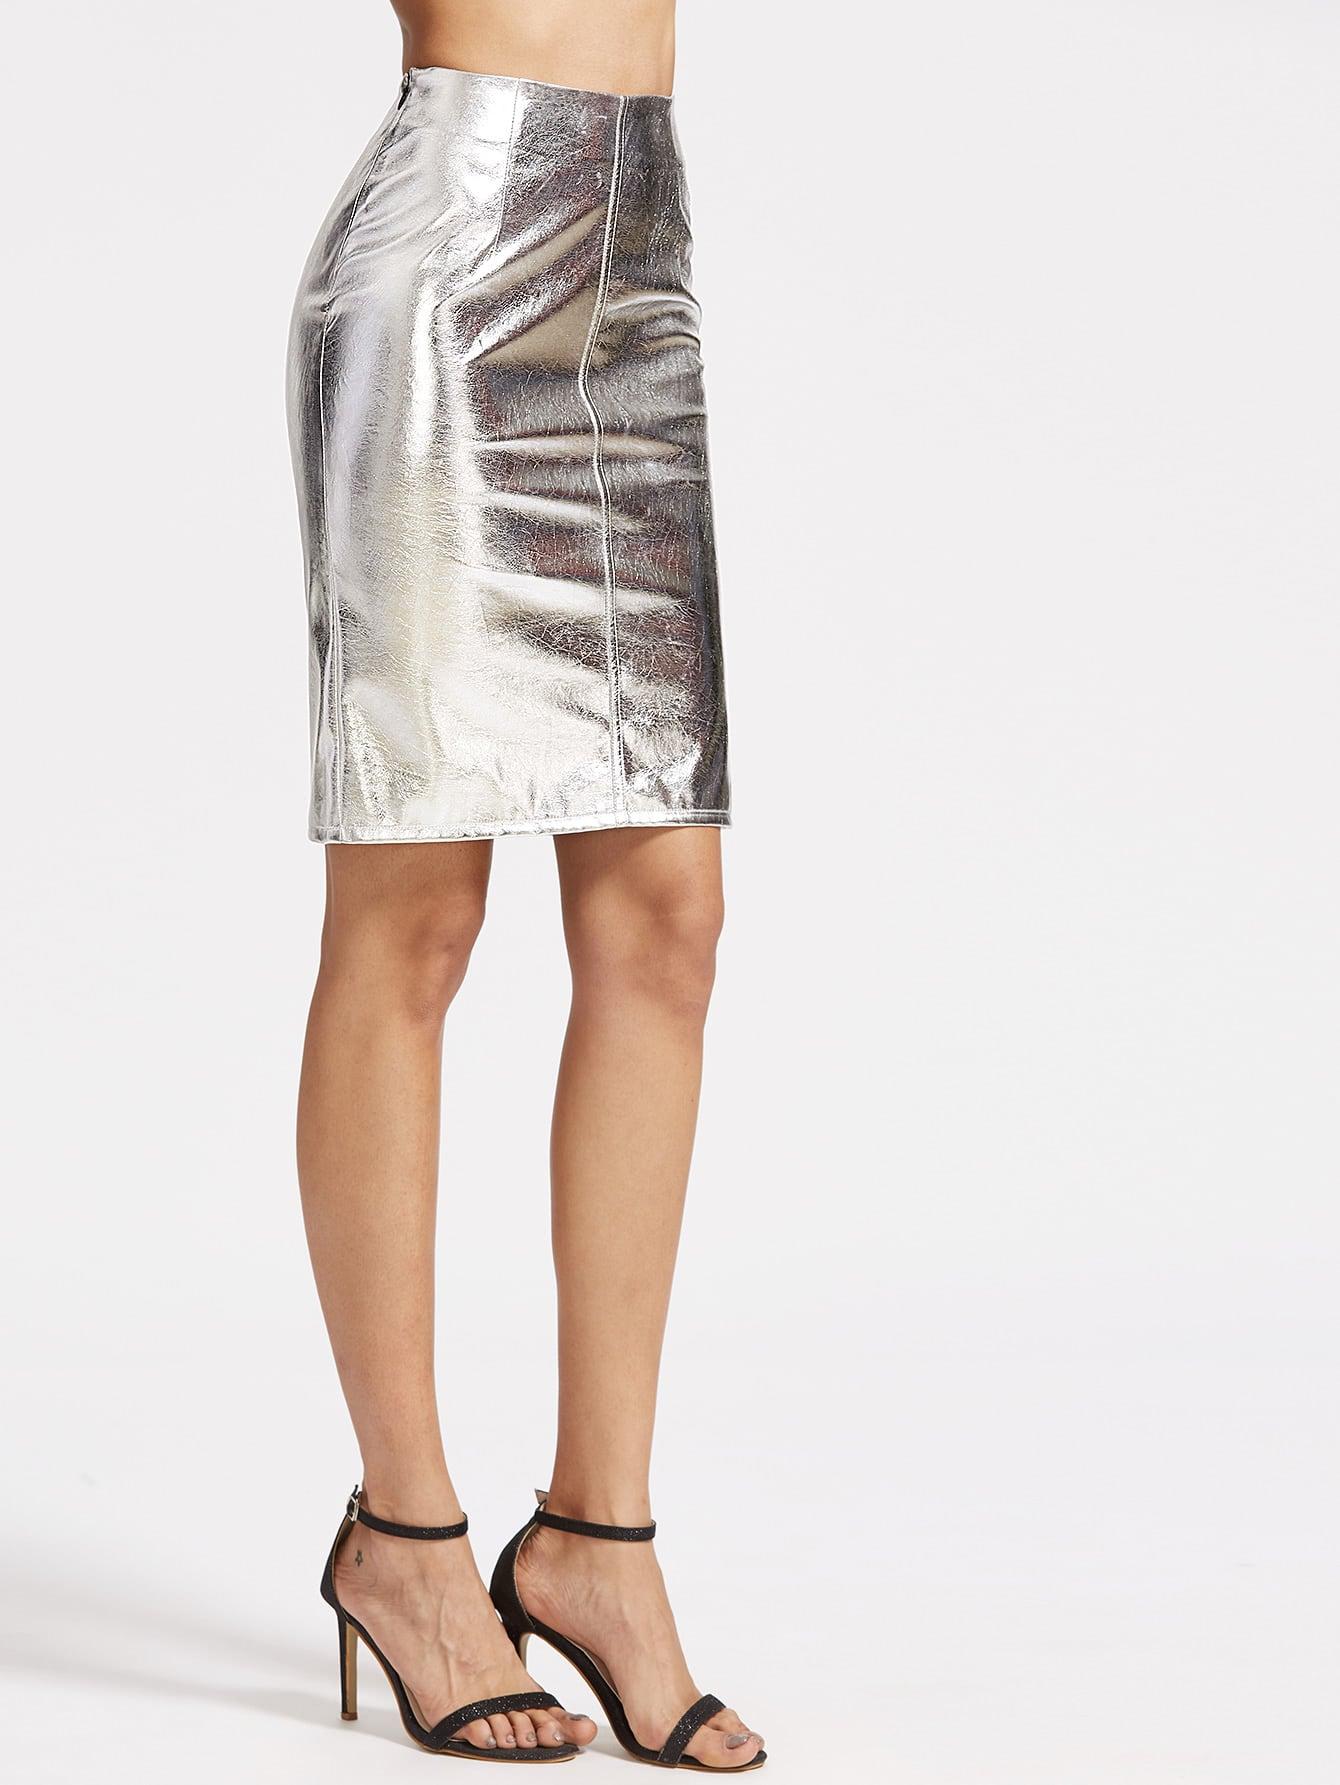 Metallic Silver Faux Suede Zip Side Pencil Skirt